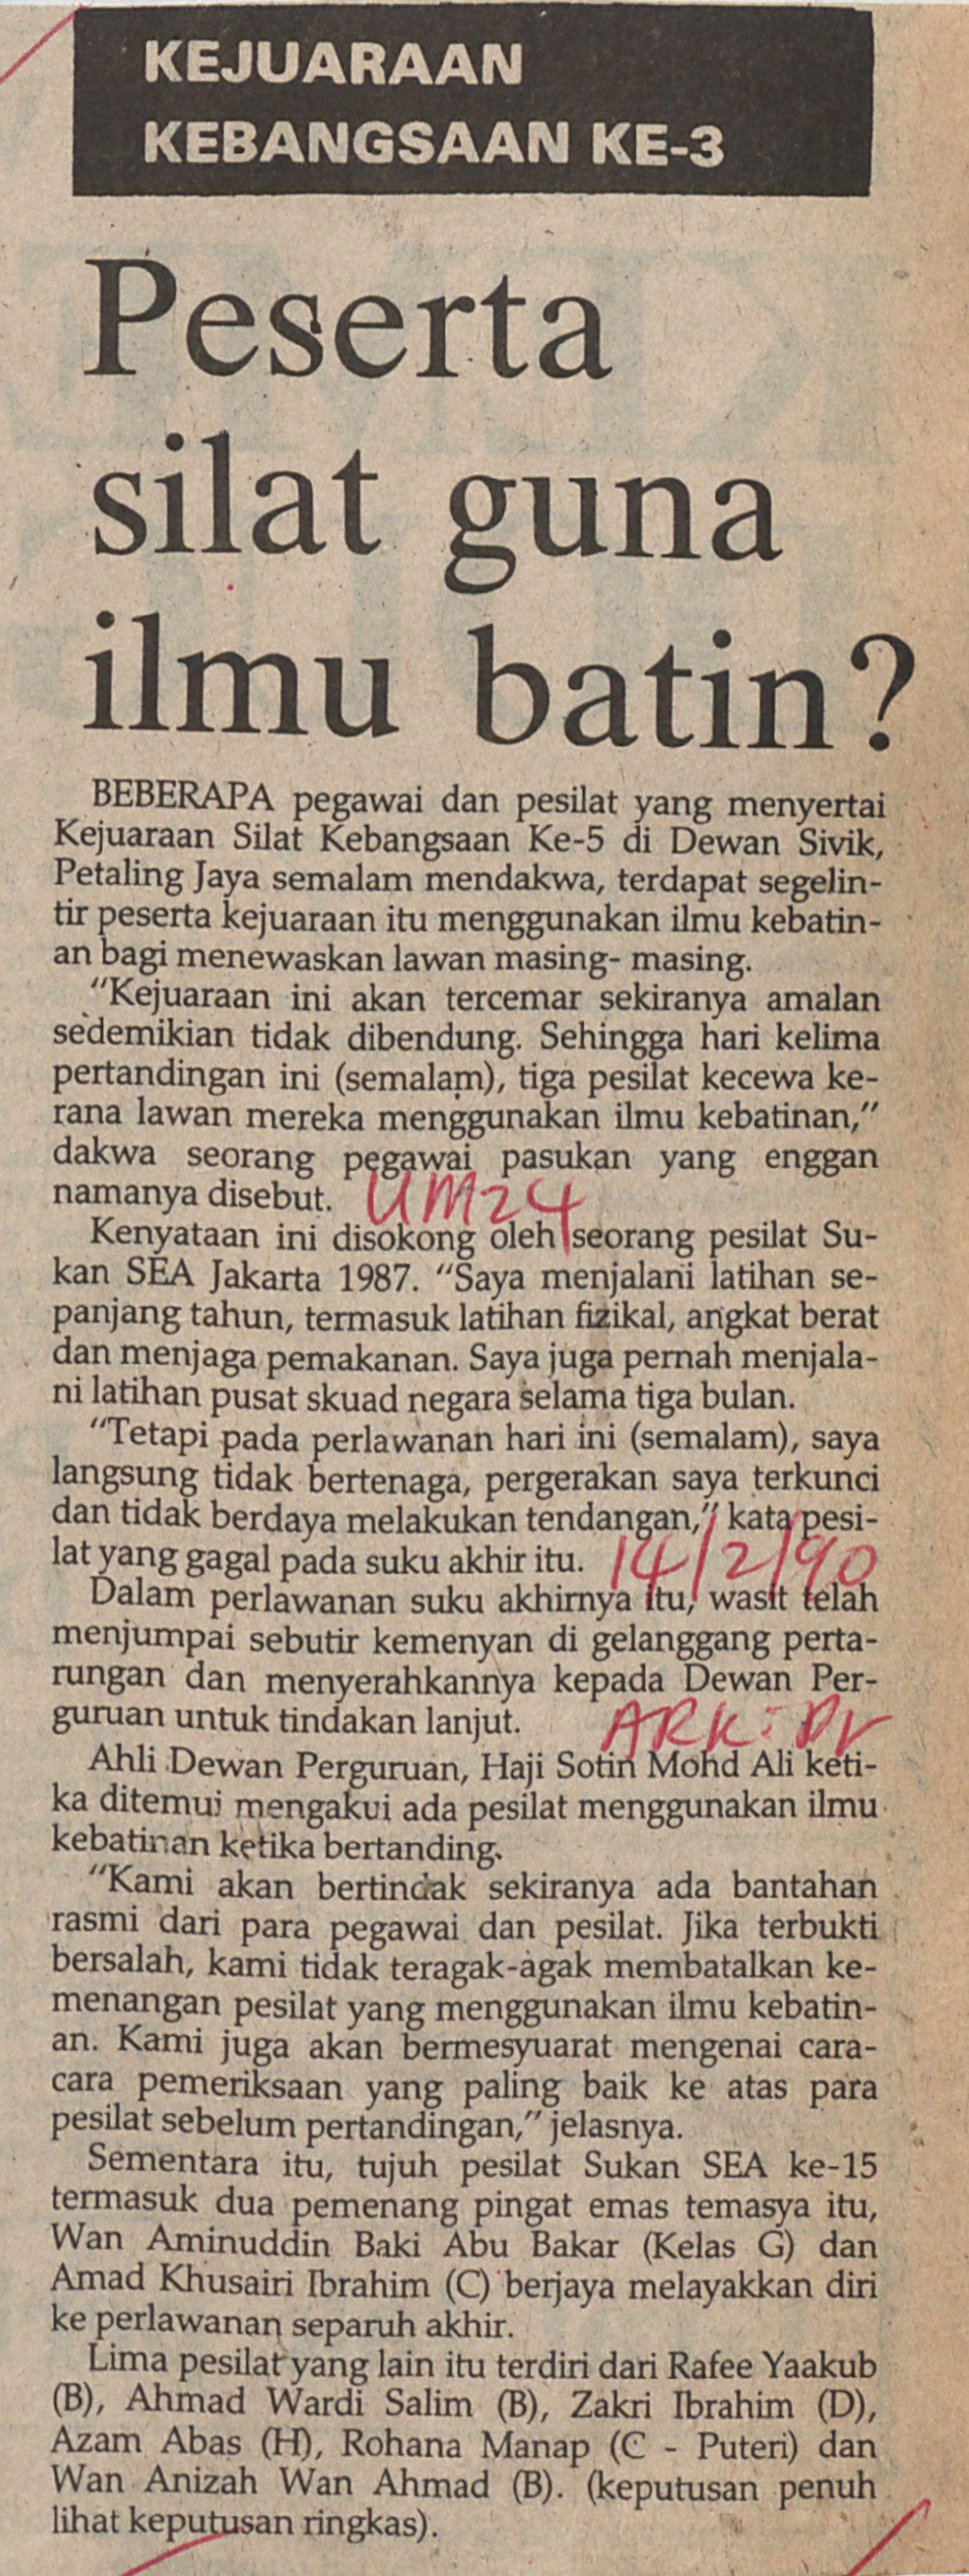 Holdings  Peserta silat guna ilmu batin  4f6bb44ddd